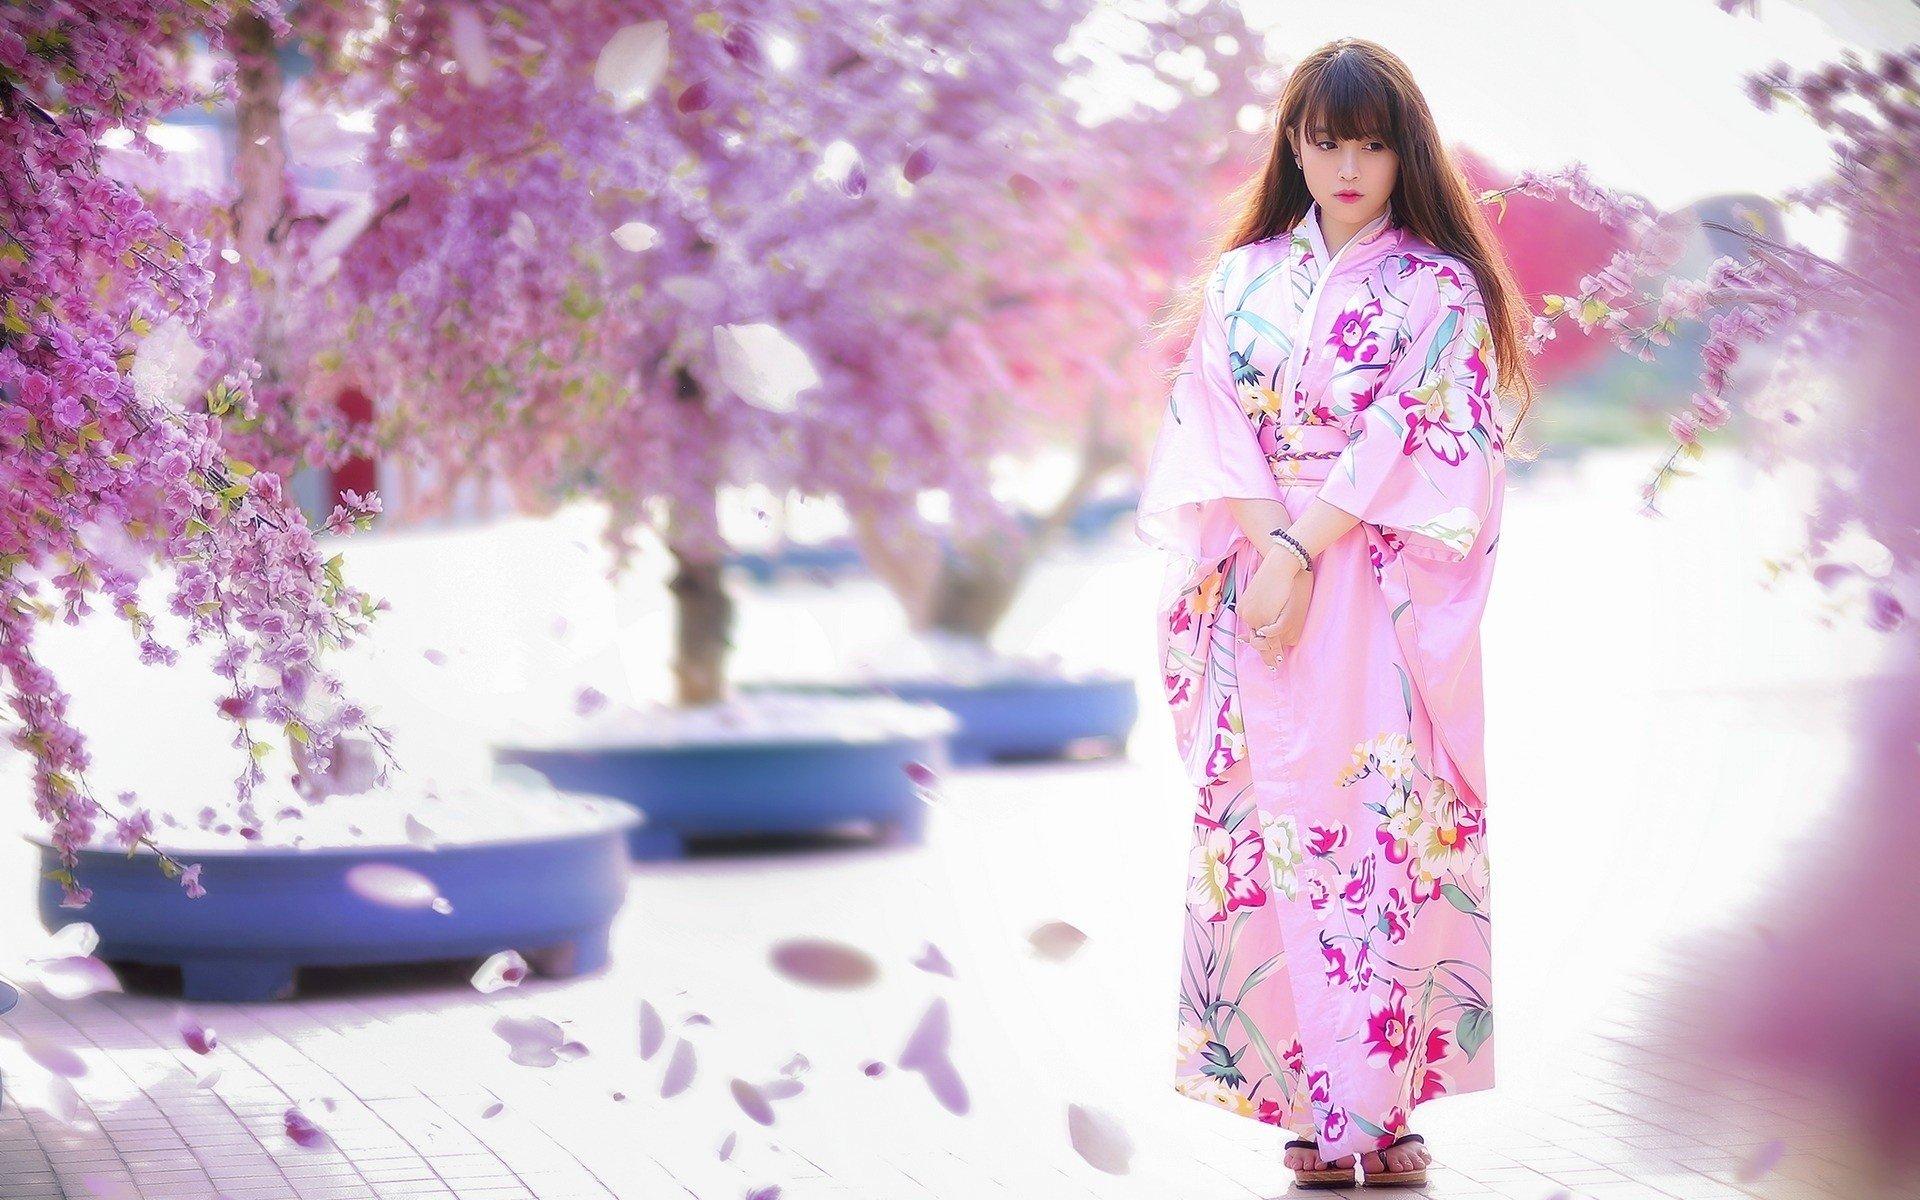 Cute Flamingo Wallpapers Women Model Brunette Long Hair Asian Women Outdoors